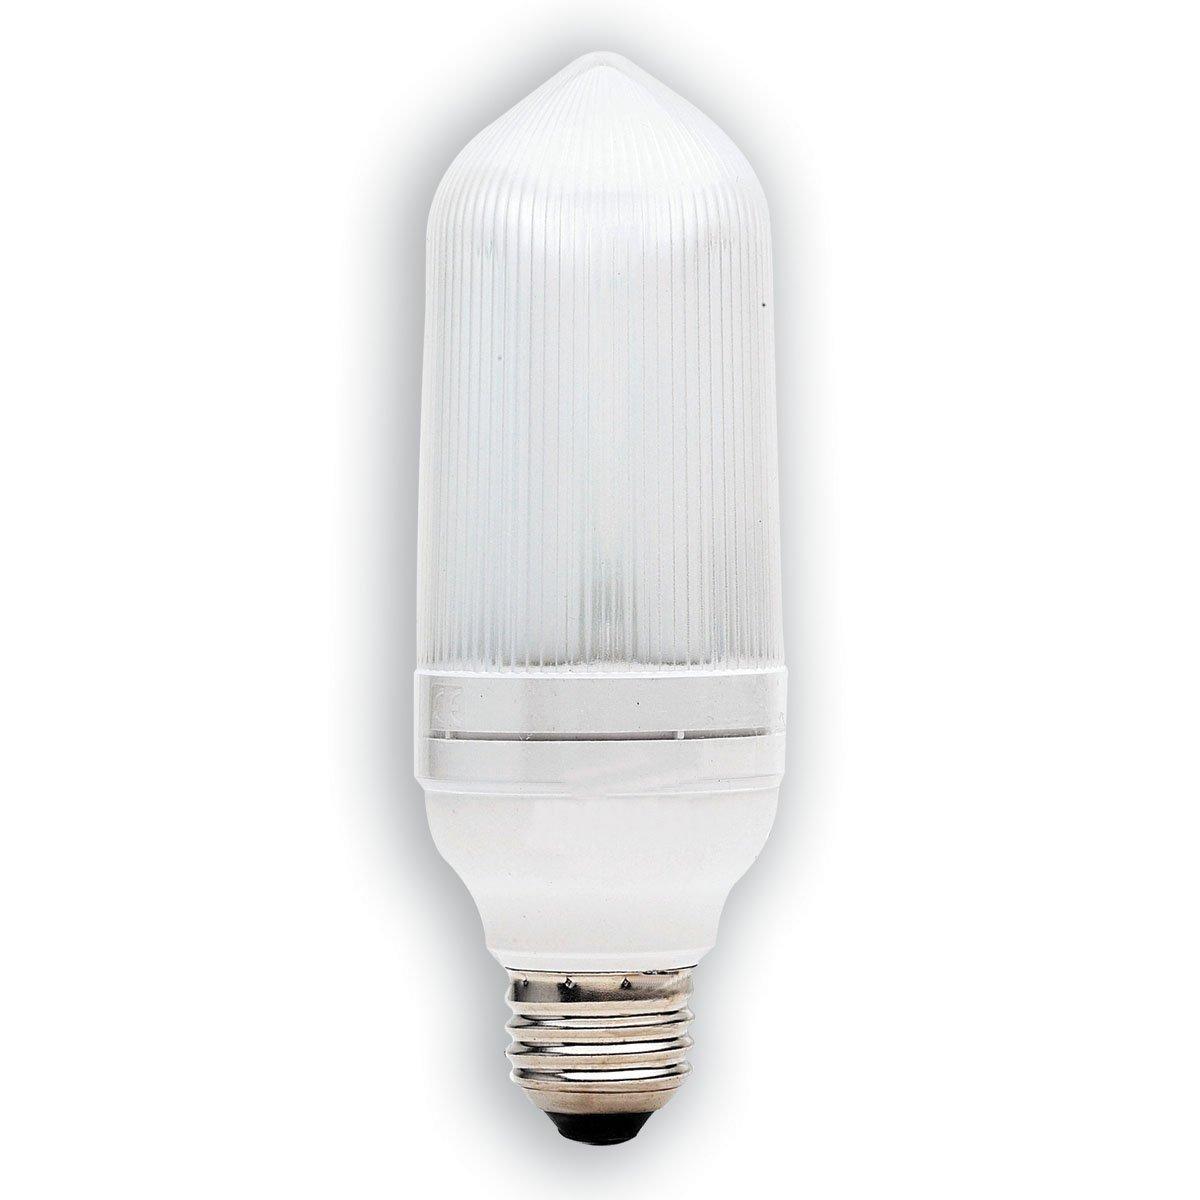 GE Lighting 49894 Energy Smart CFL 14-Watt (40-watt replacement) 750-Lumens Postlight Bulb with Medium Base, 1-Pack